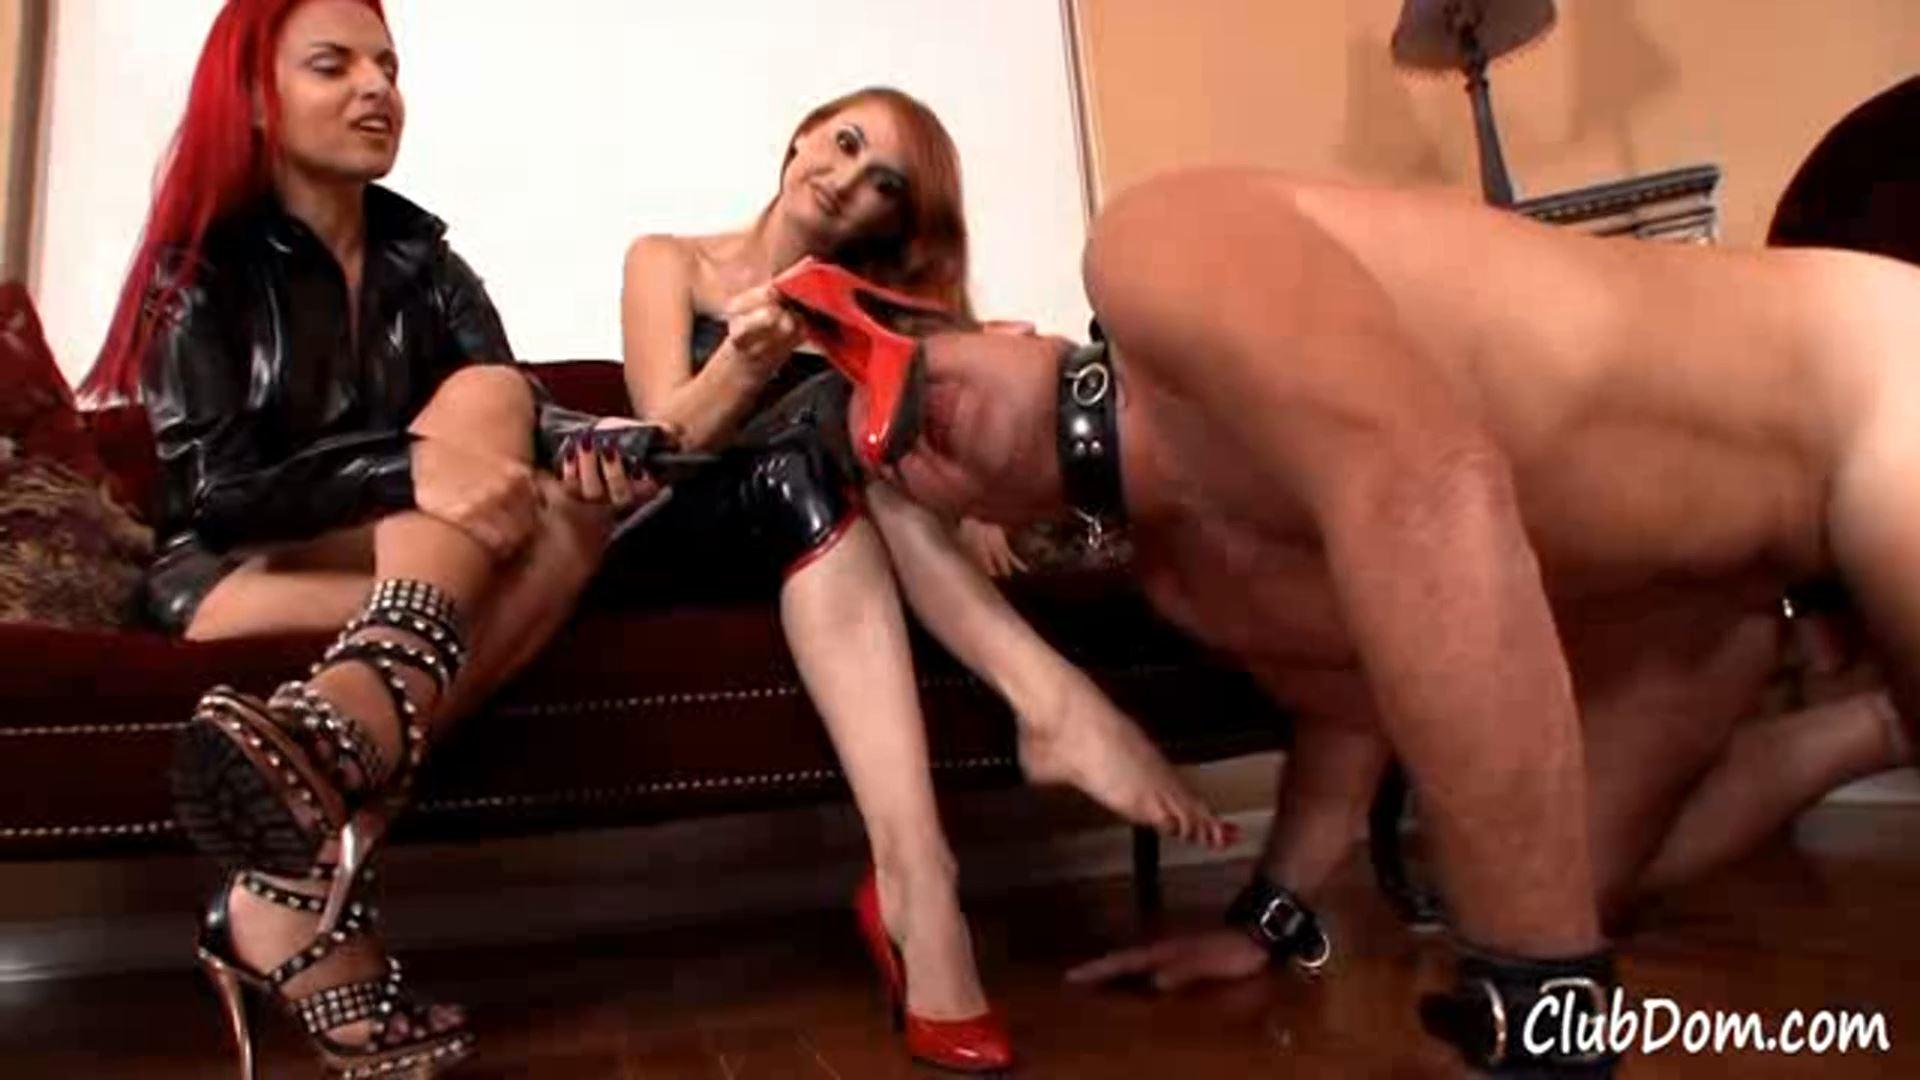 Kendra James, Mistrix In Scene: High Heel Teasing - CLUBDOM / RUTHLESSVIXEN - FULL HD/1080p/MP4